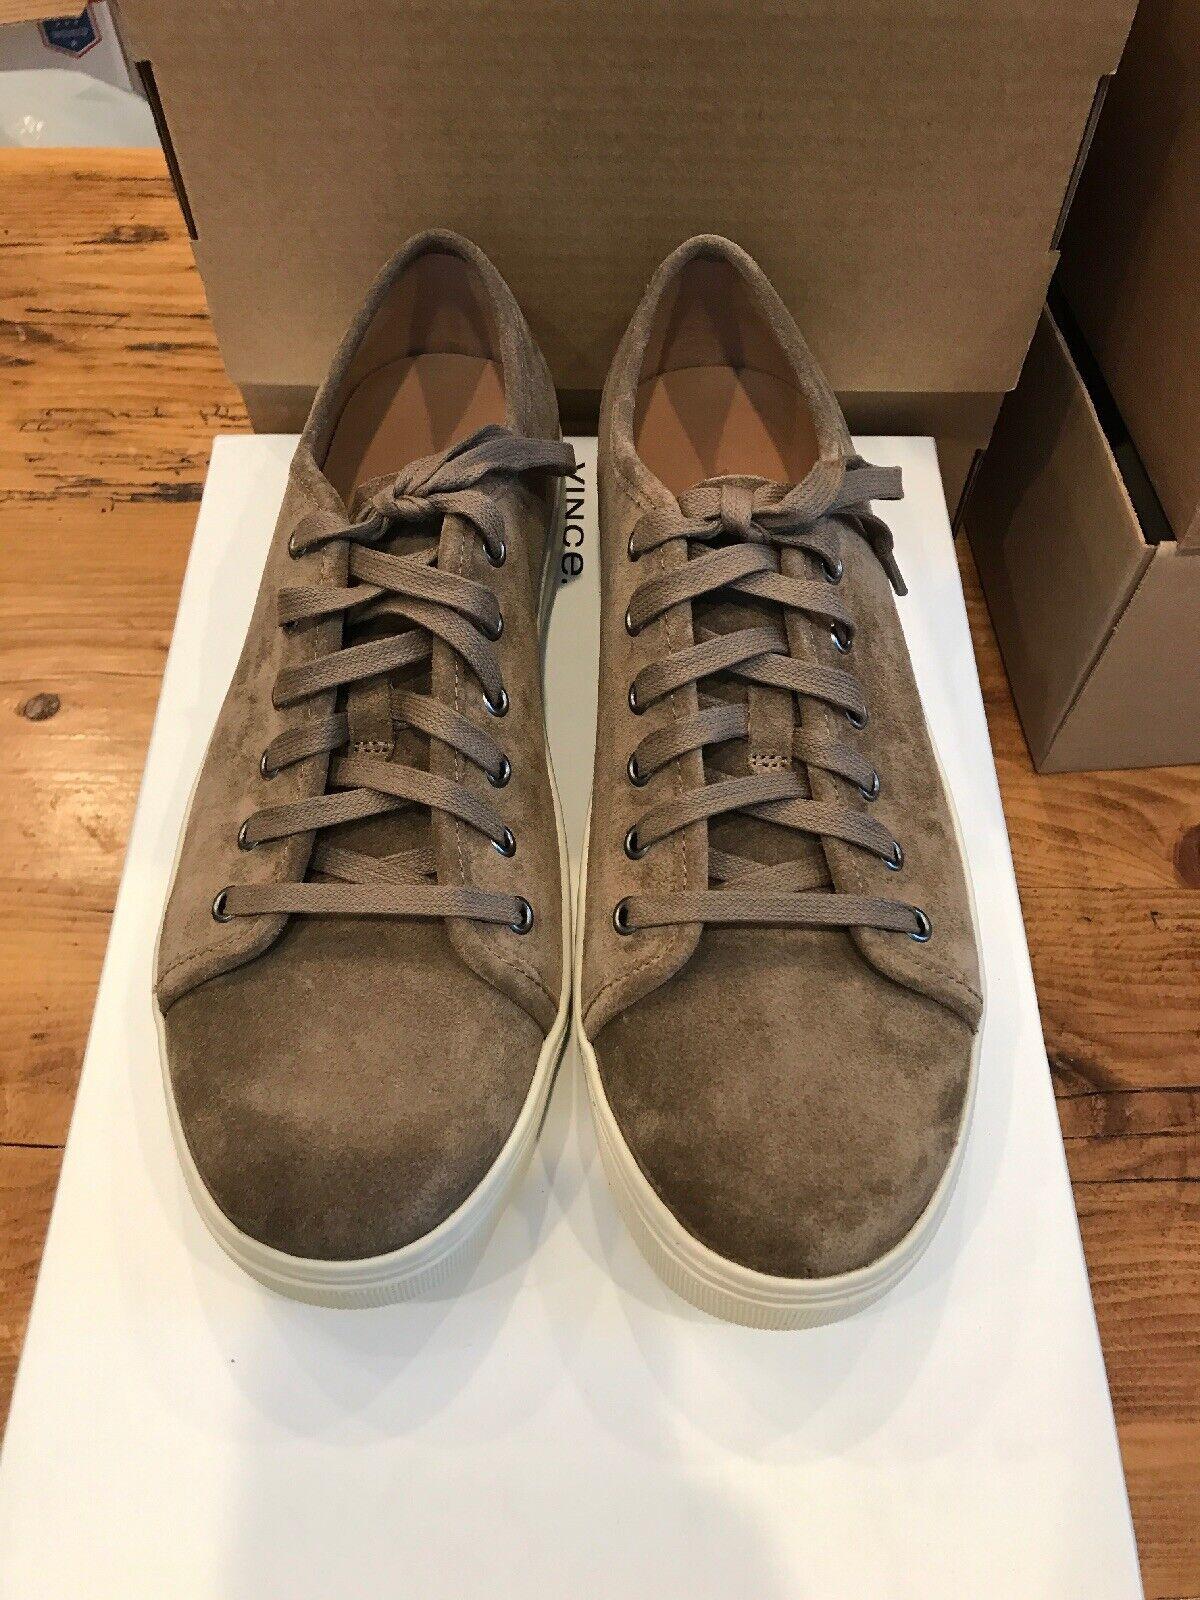 Vince Copeland Austin Suede Sneakers - Size 8 color Truffle